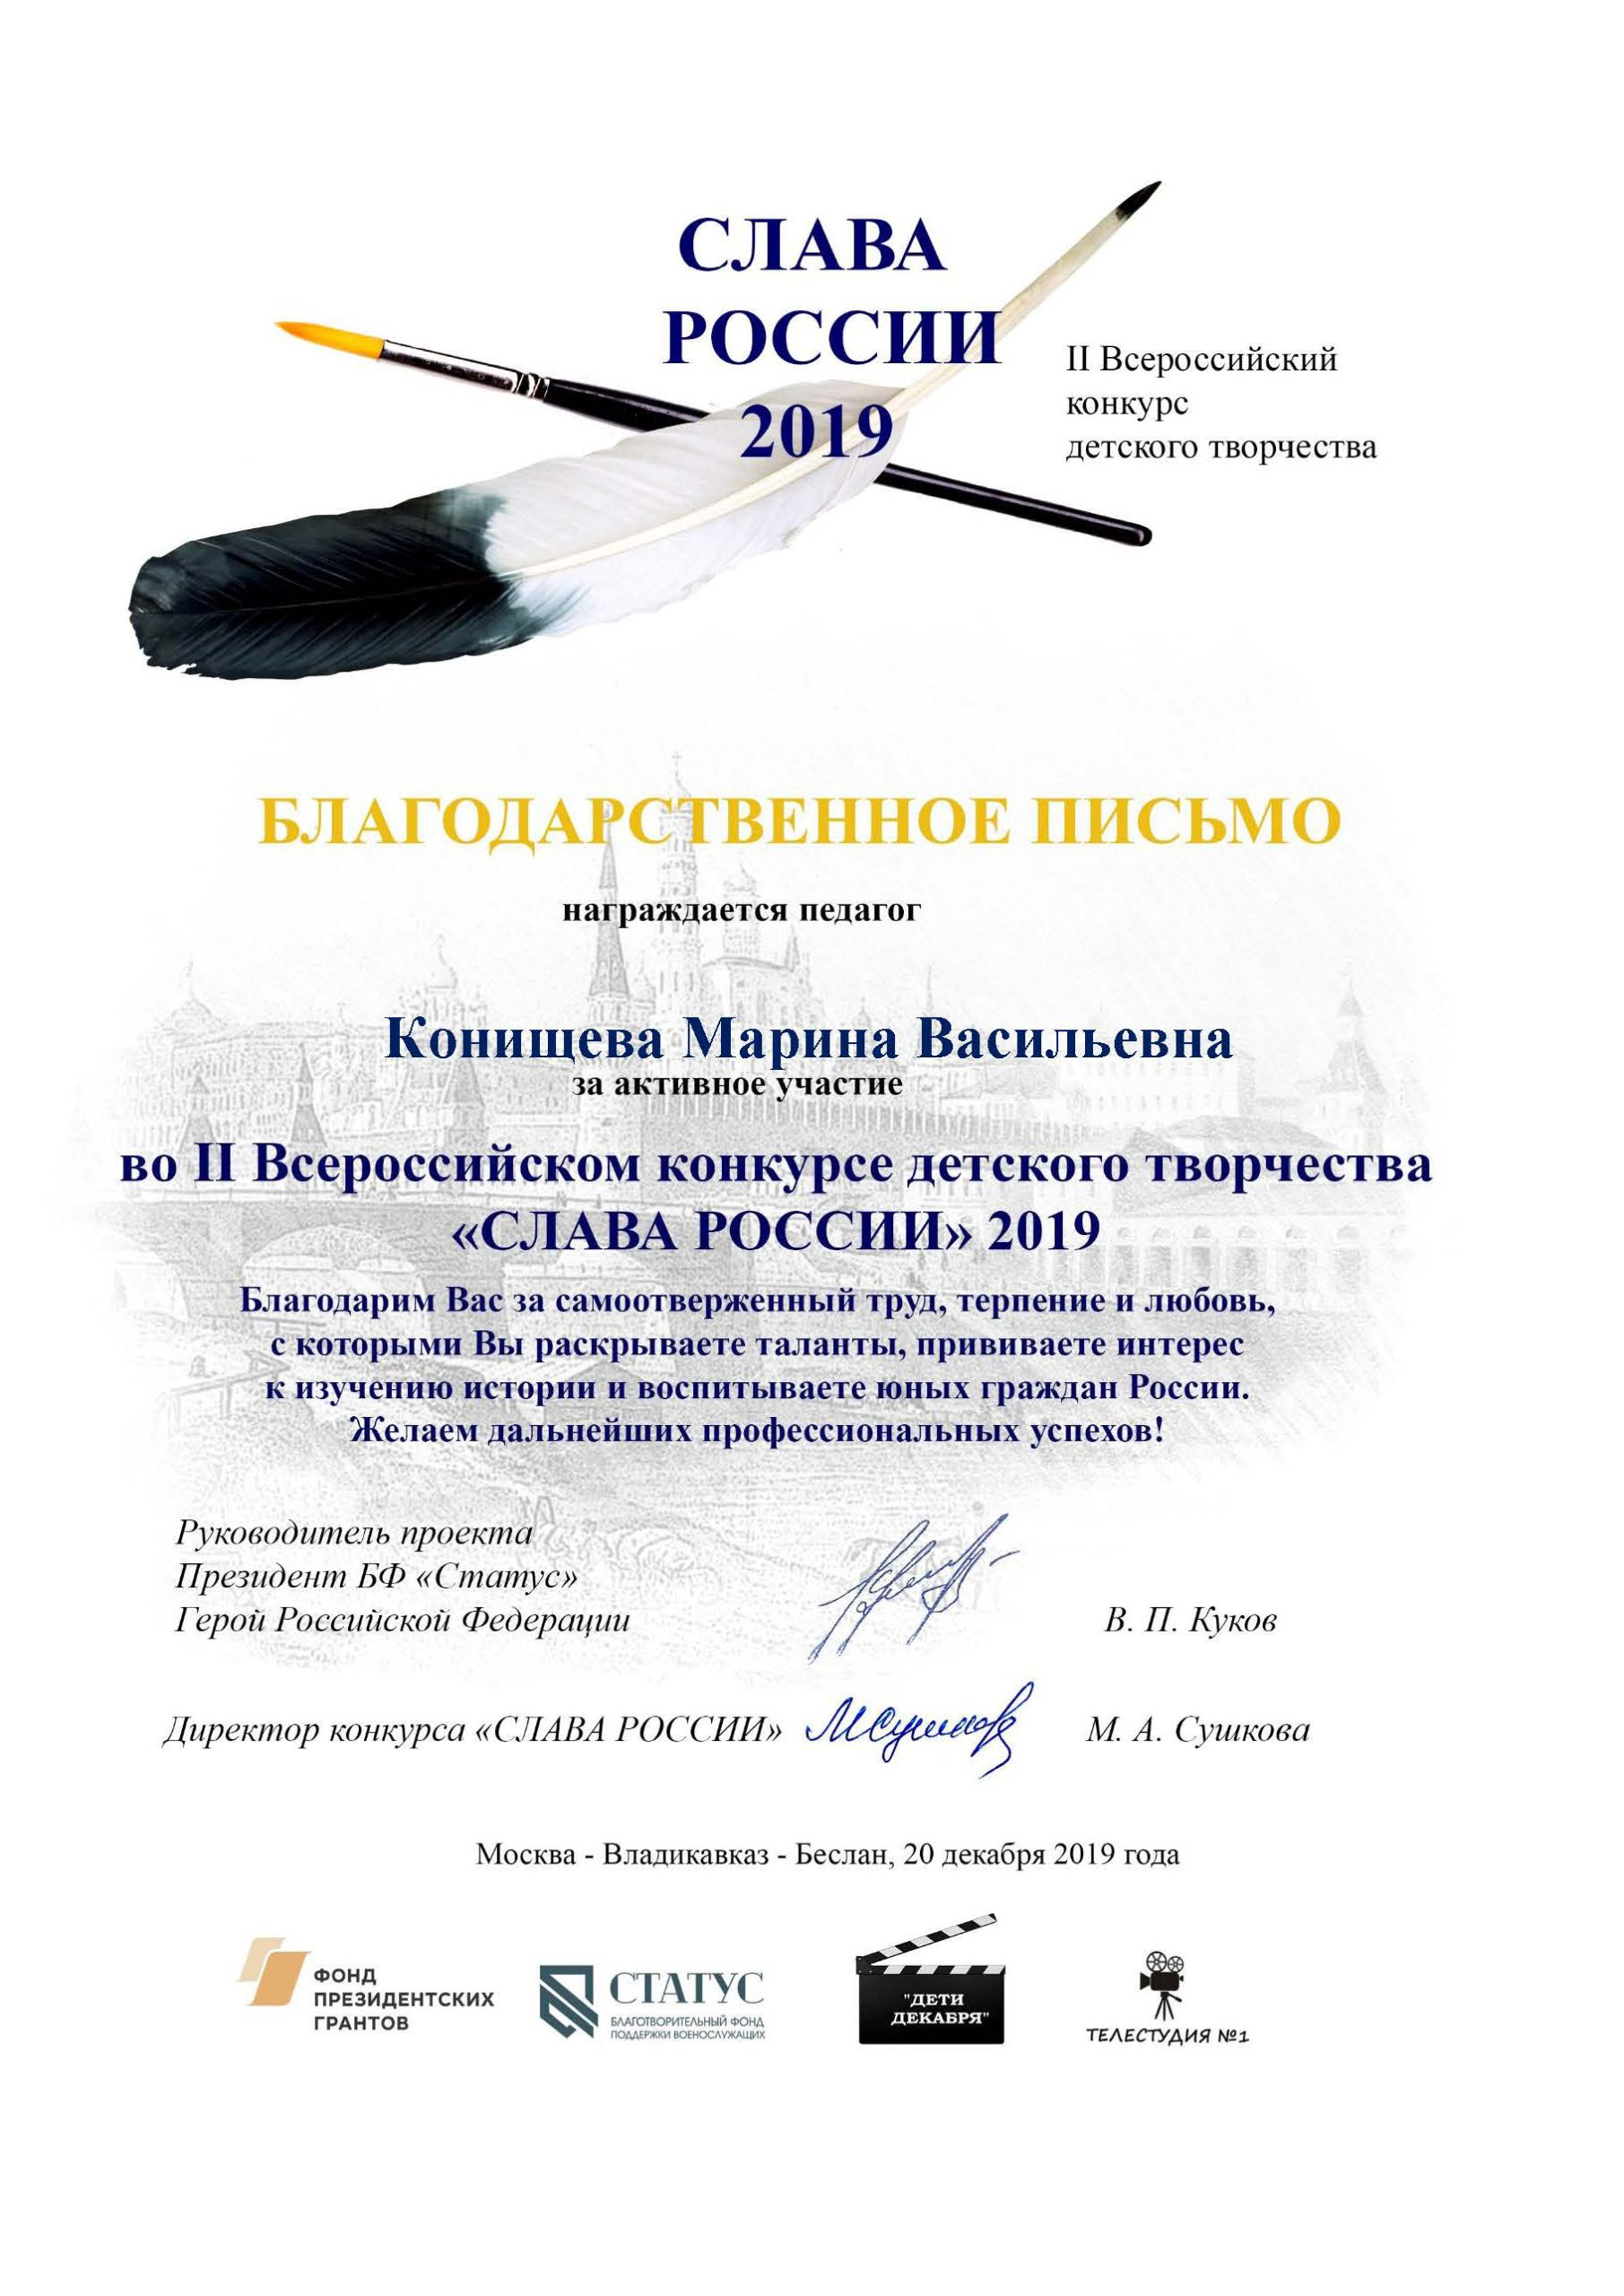 Конищева Марина Васильевна